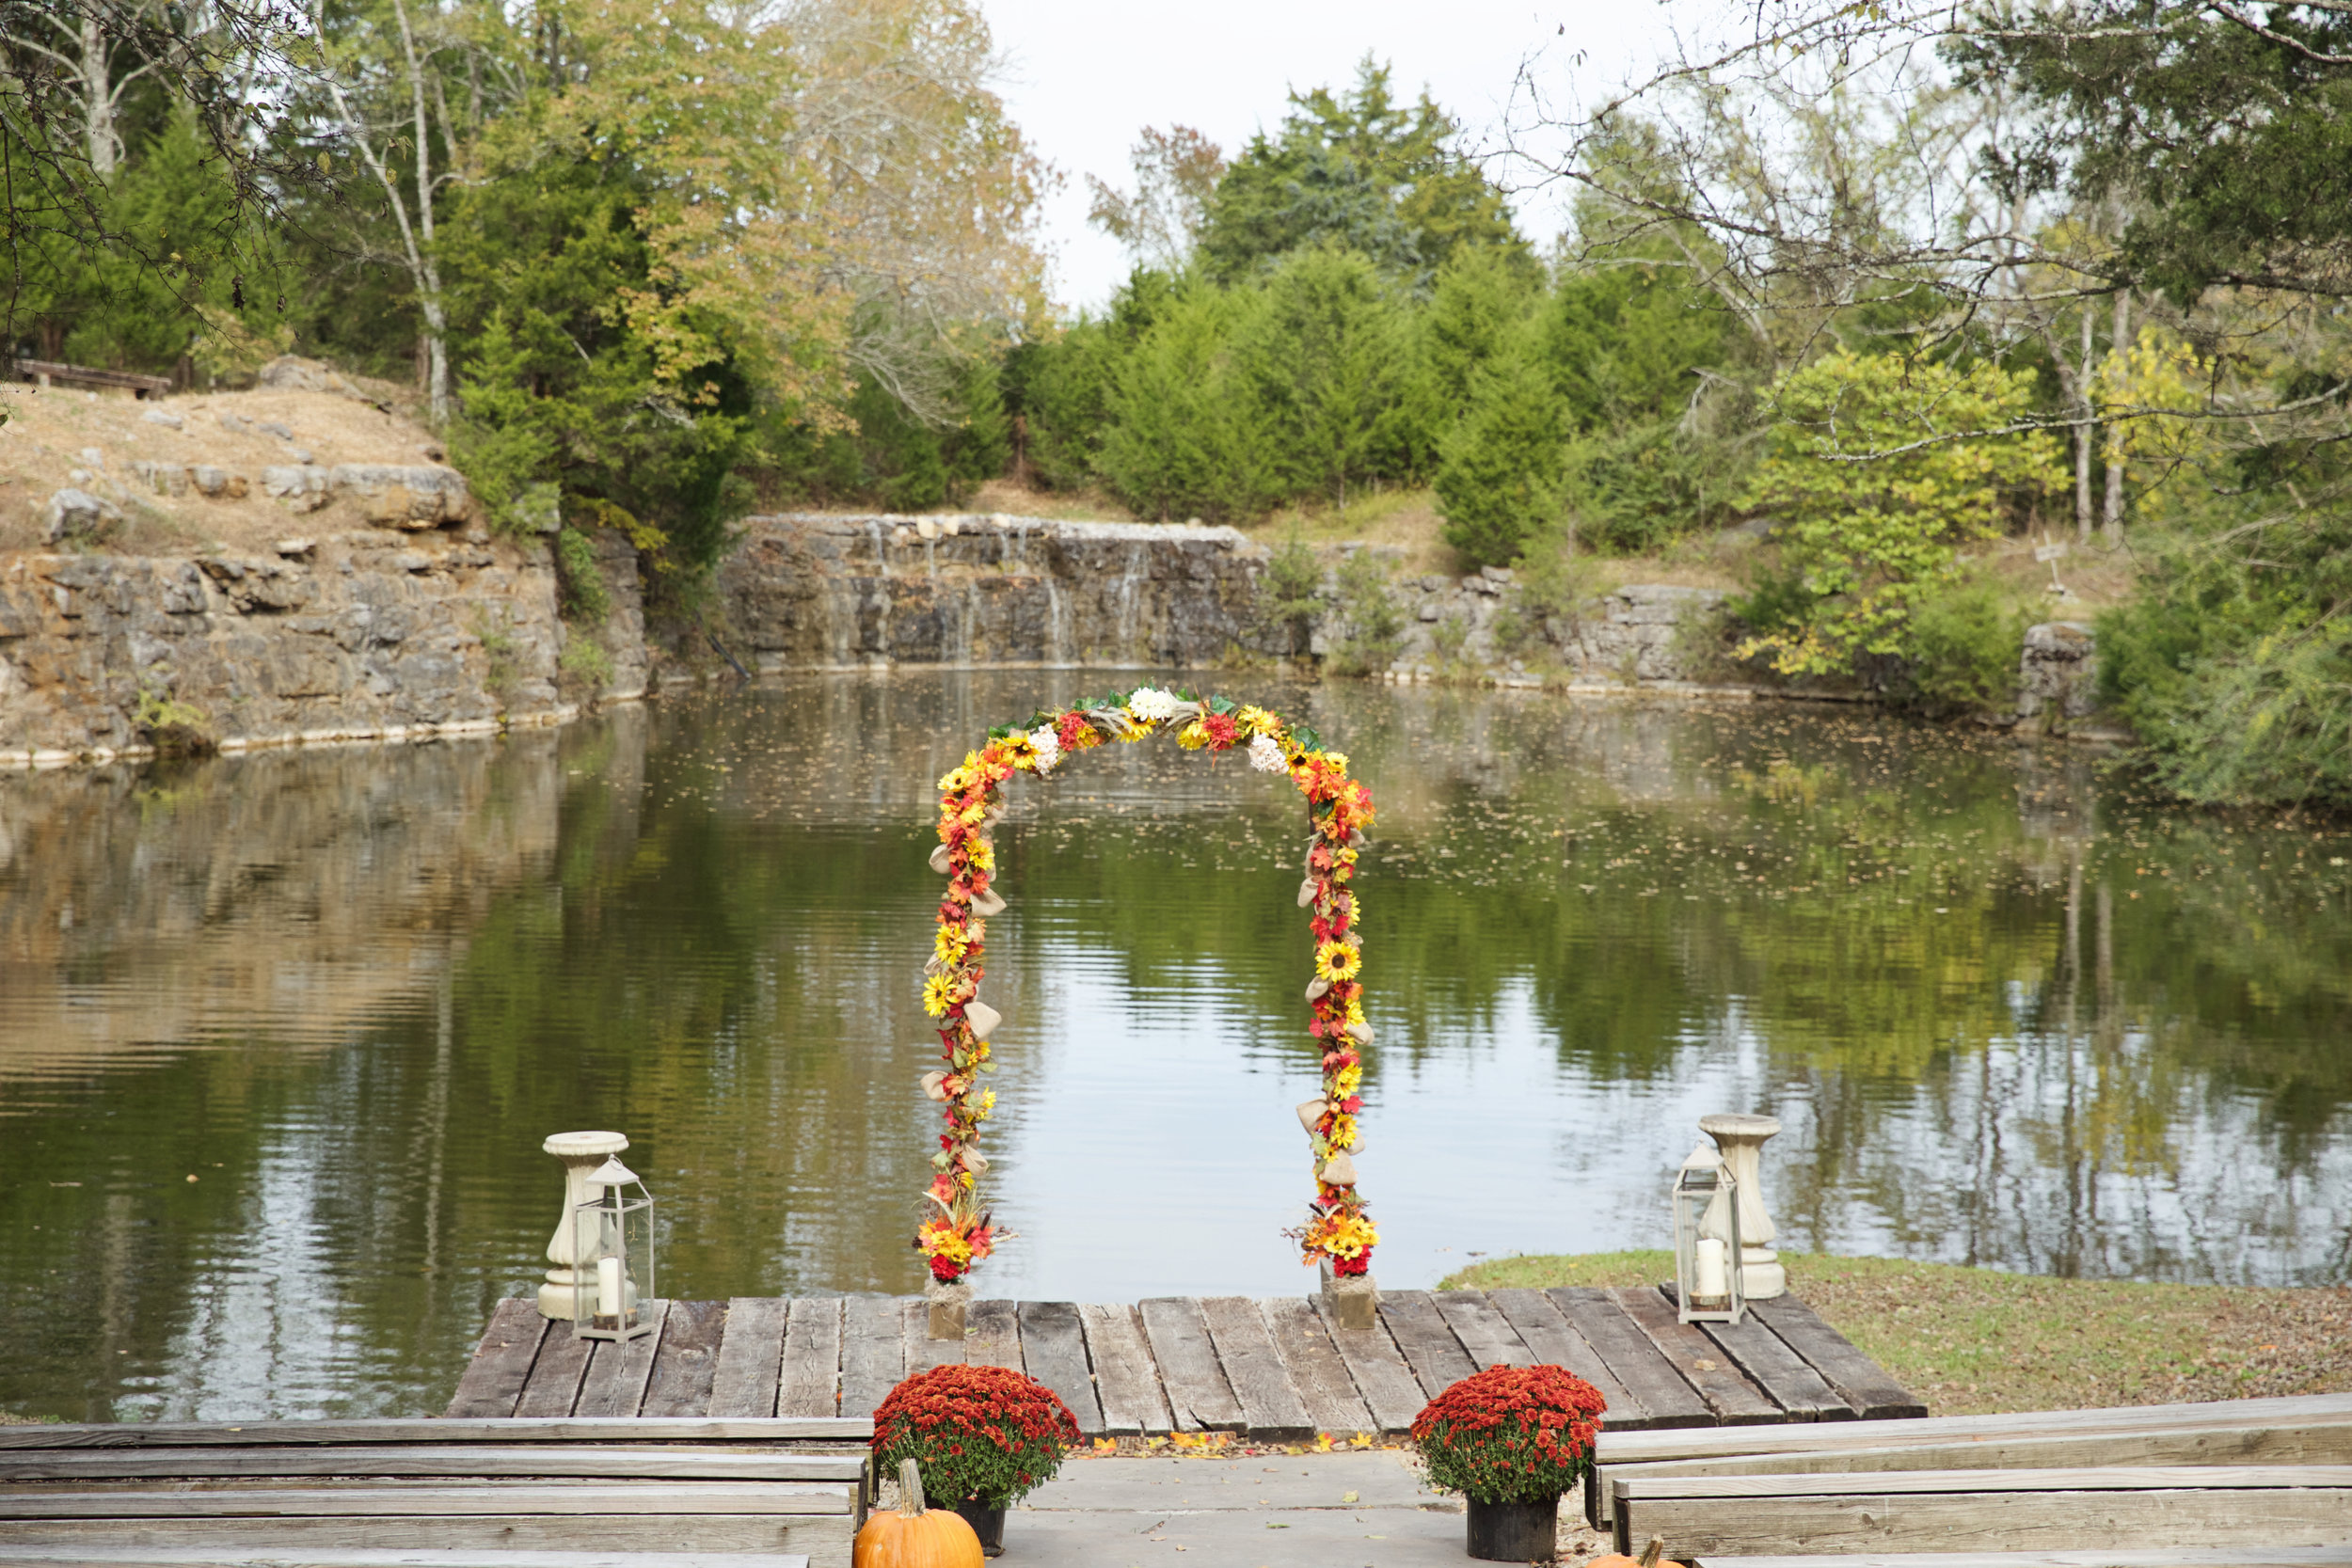 8-everlasting-pond-scene.jpg